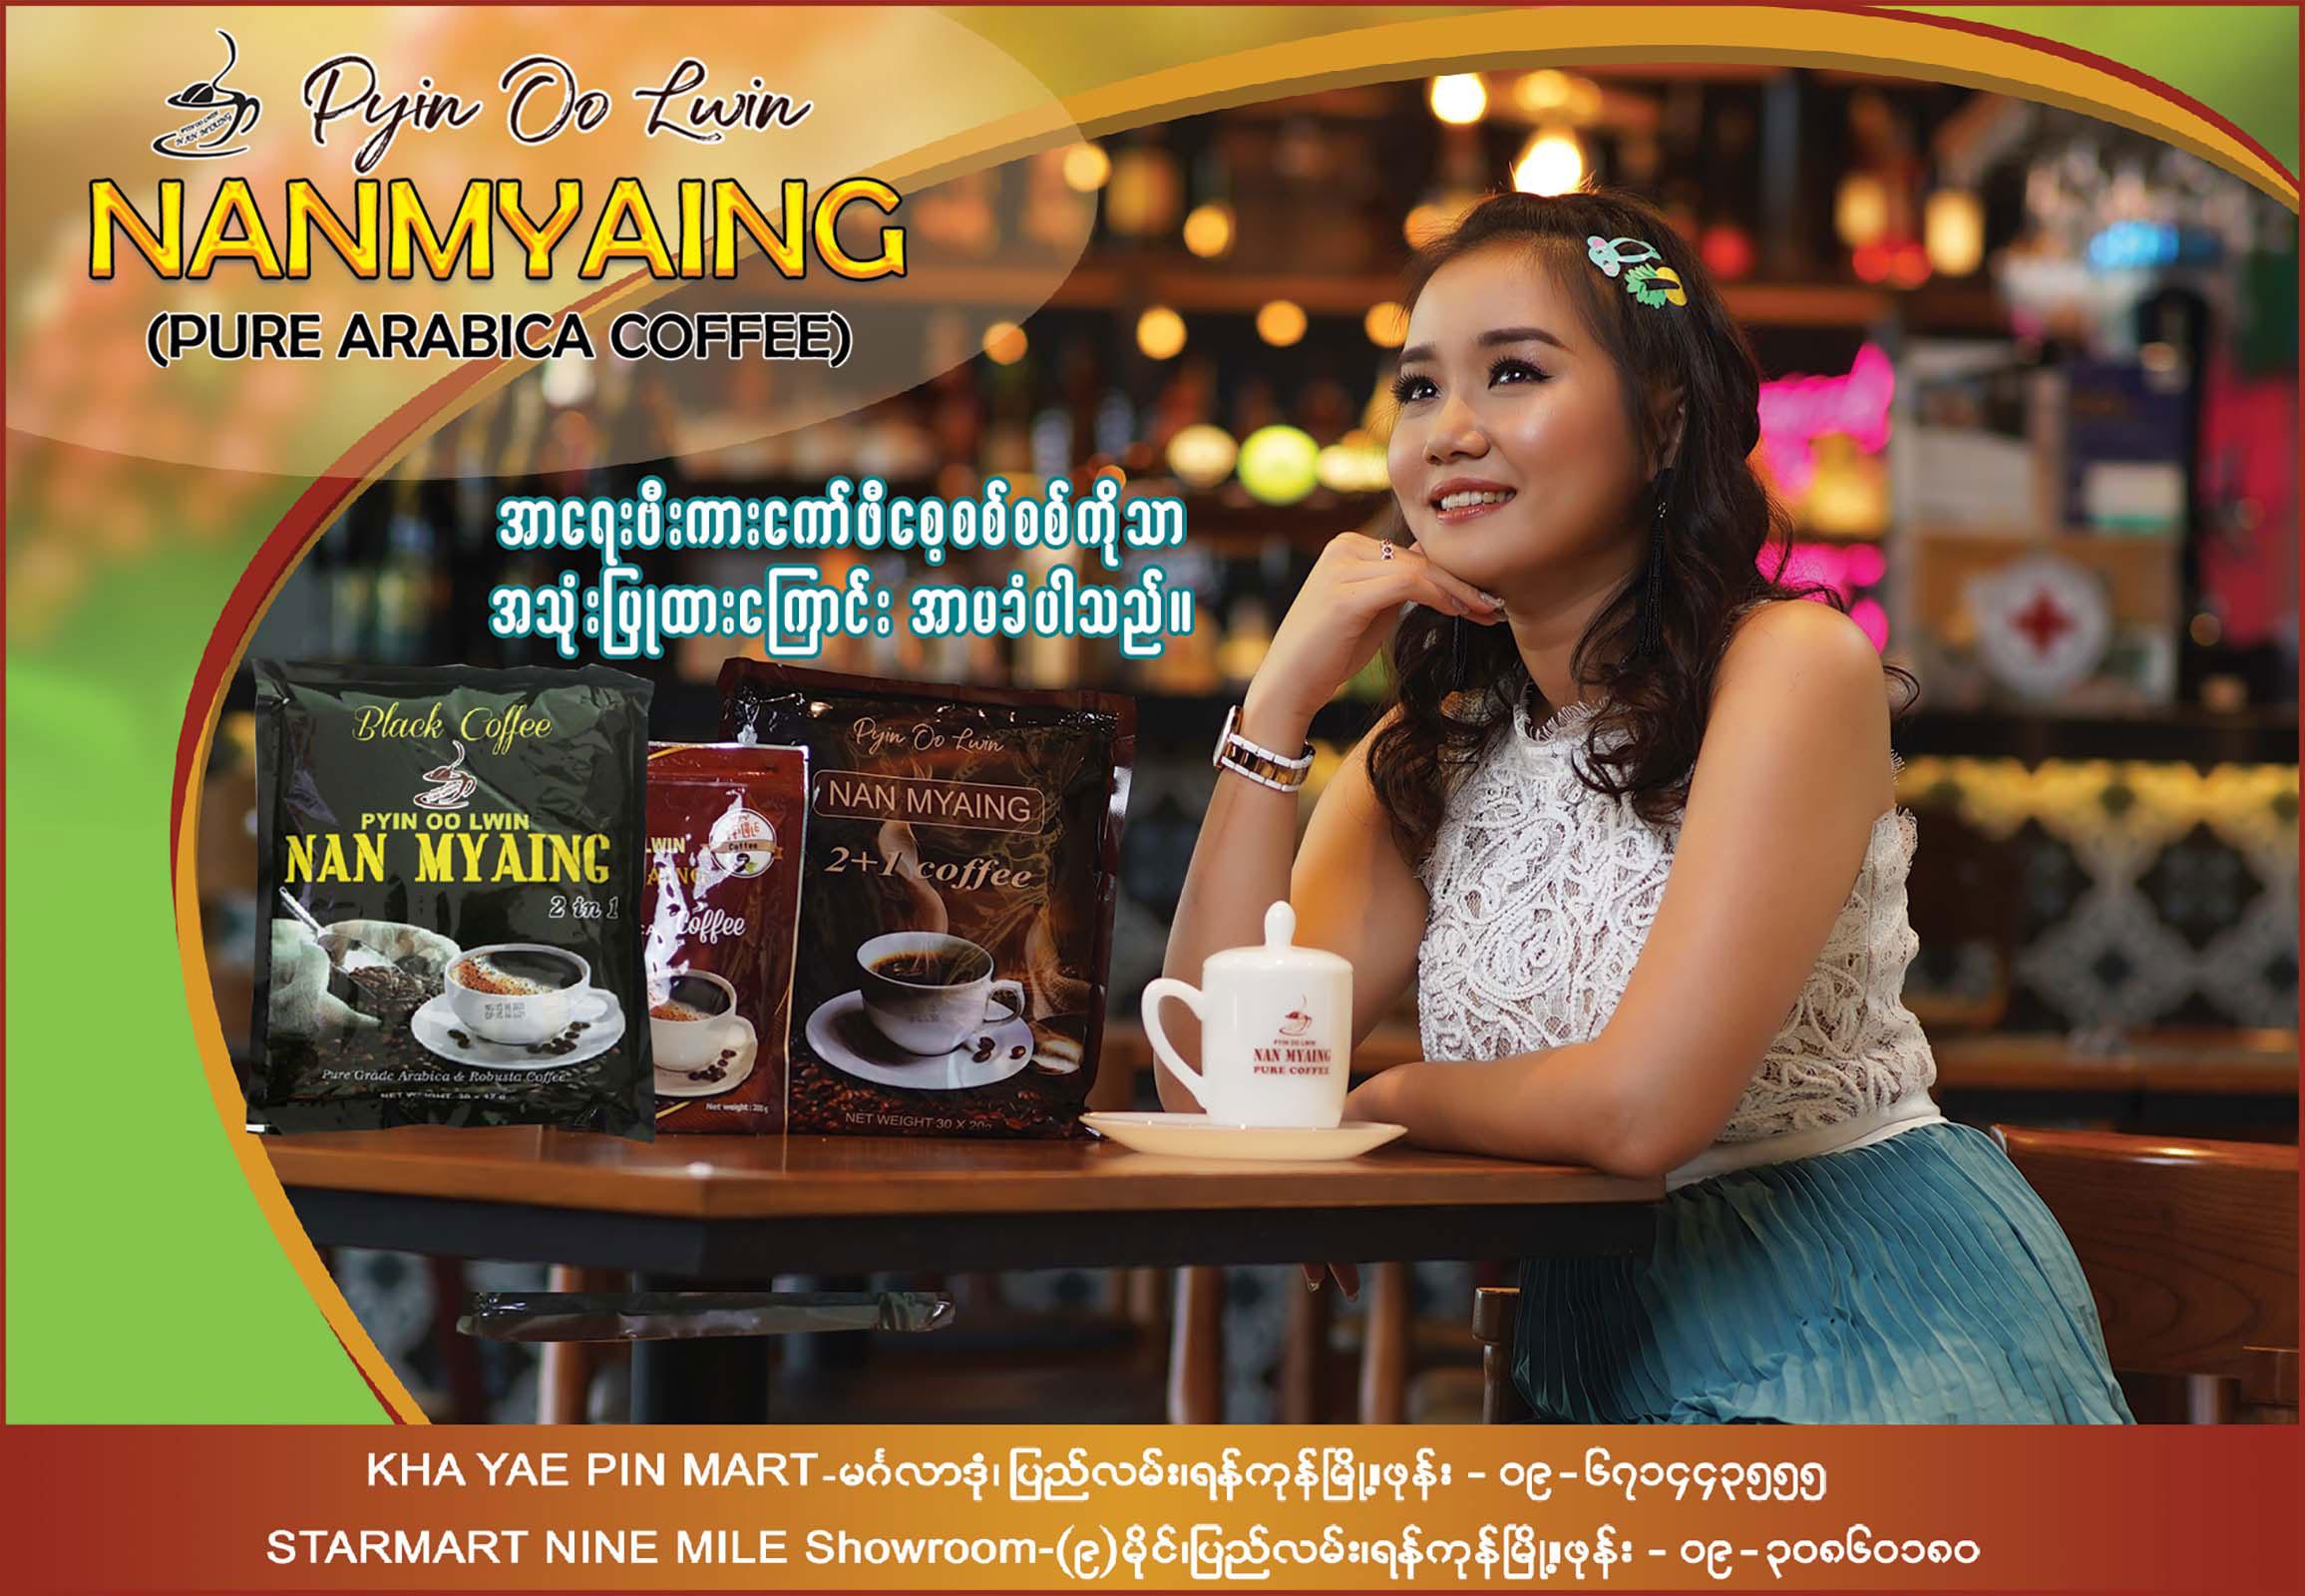 Pyin Oo Lwin Nan Myaing Coffee